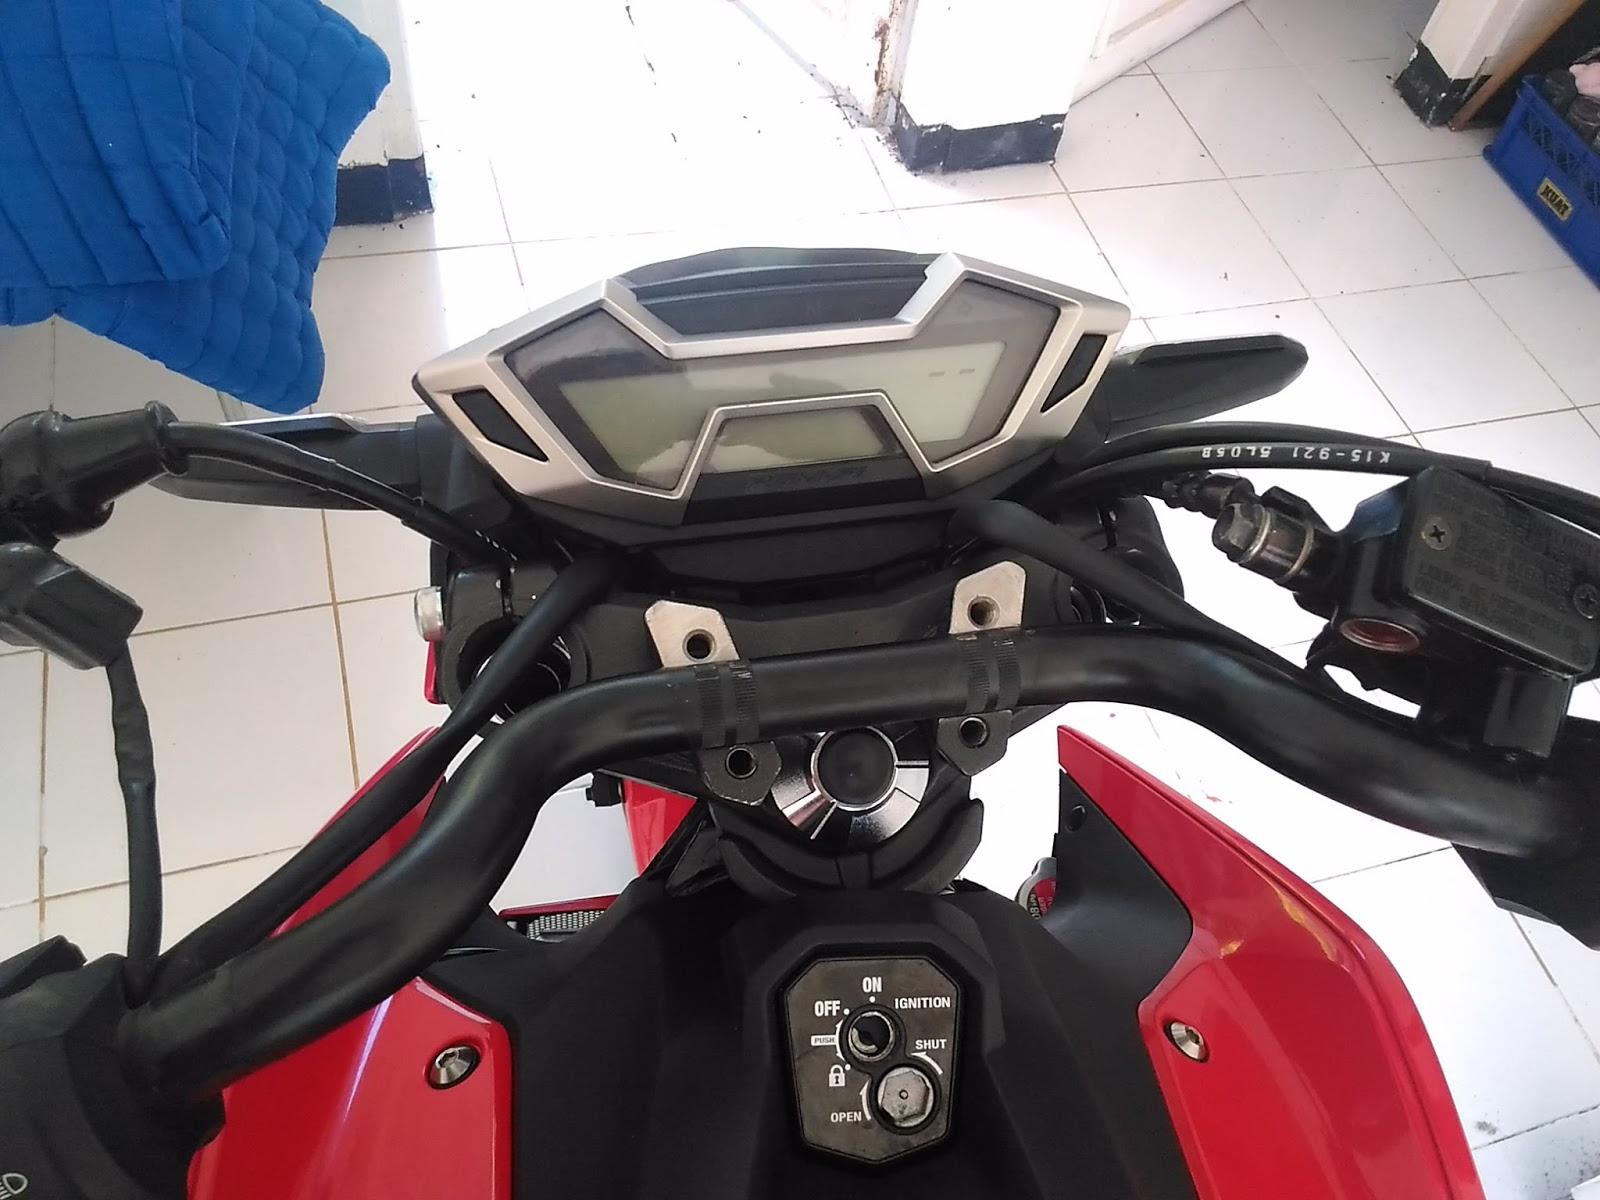 Mari Berbagi Pasang Stang Yamaha Byson Ke All New Cb150r Baut Jalu L Pengikat